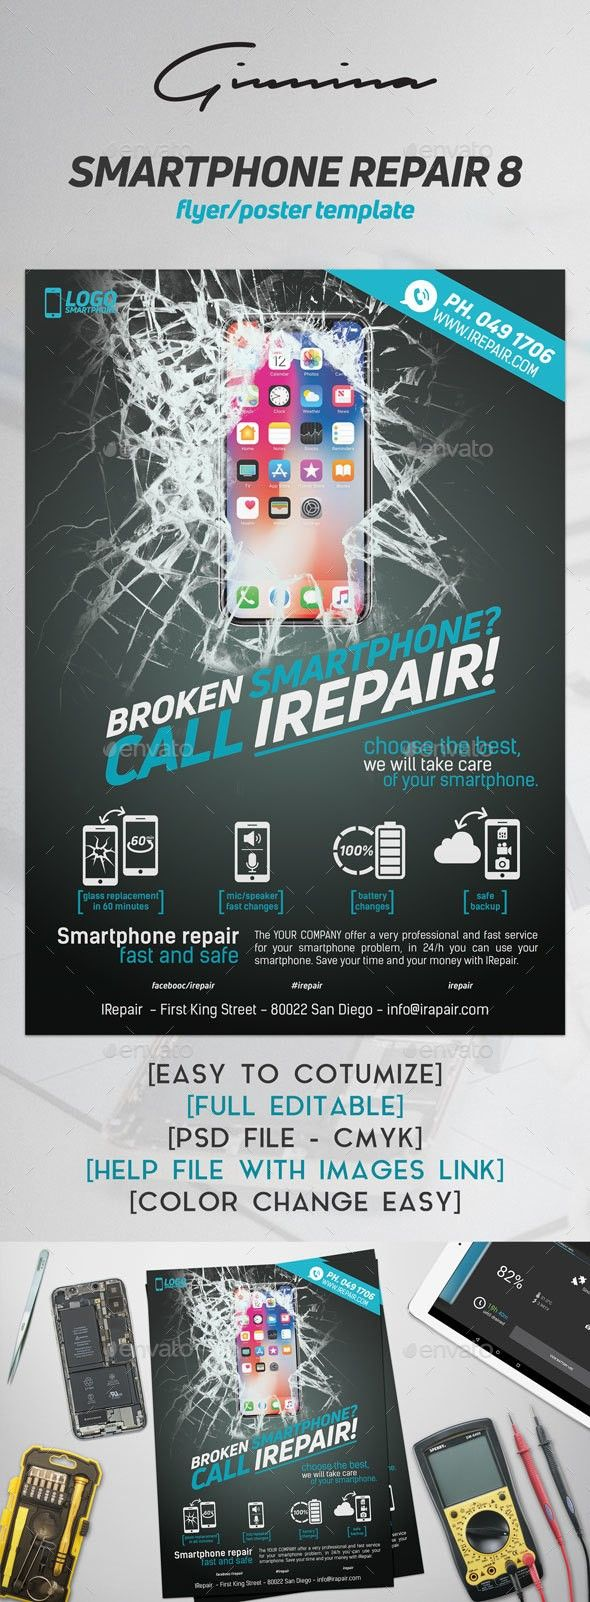 Battery Broken Case Cellular Cover Damaged Display Electronics Fast Fix Flyer Glass Mobile Pad Phone Phones Smartphone Repair Repair Smartphone